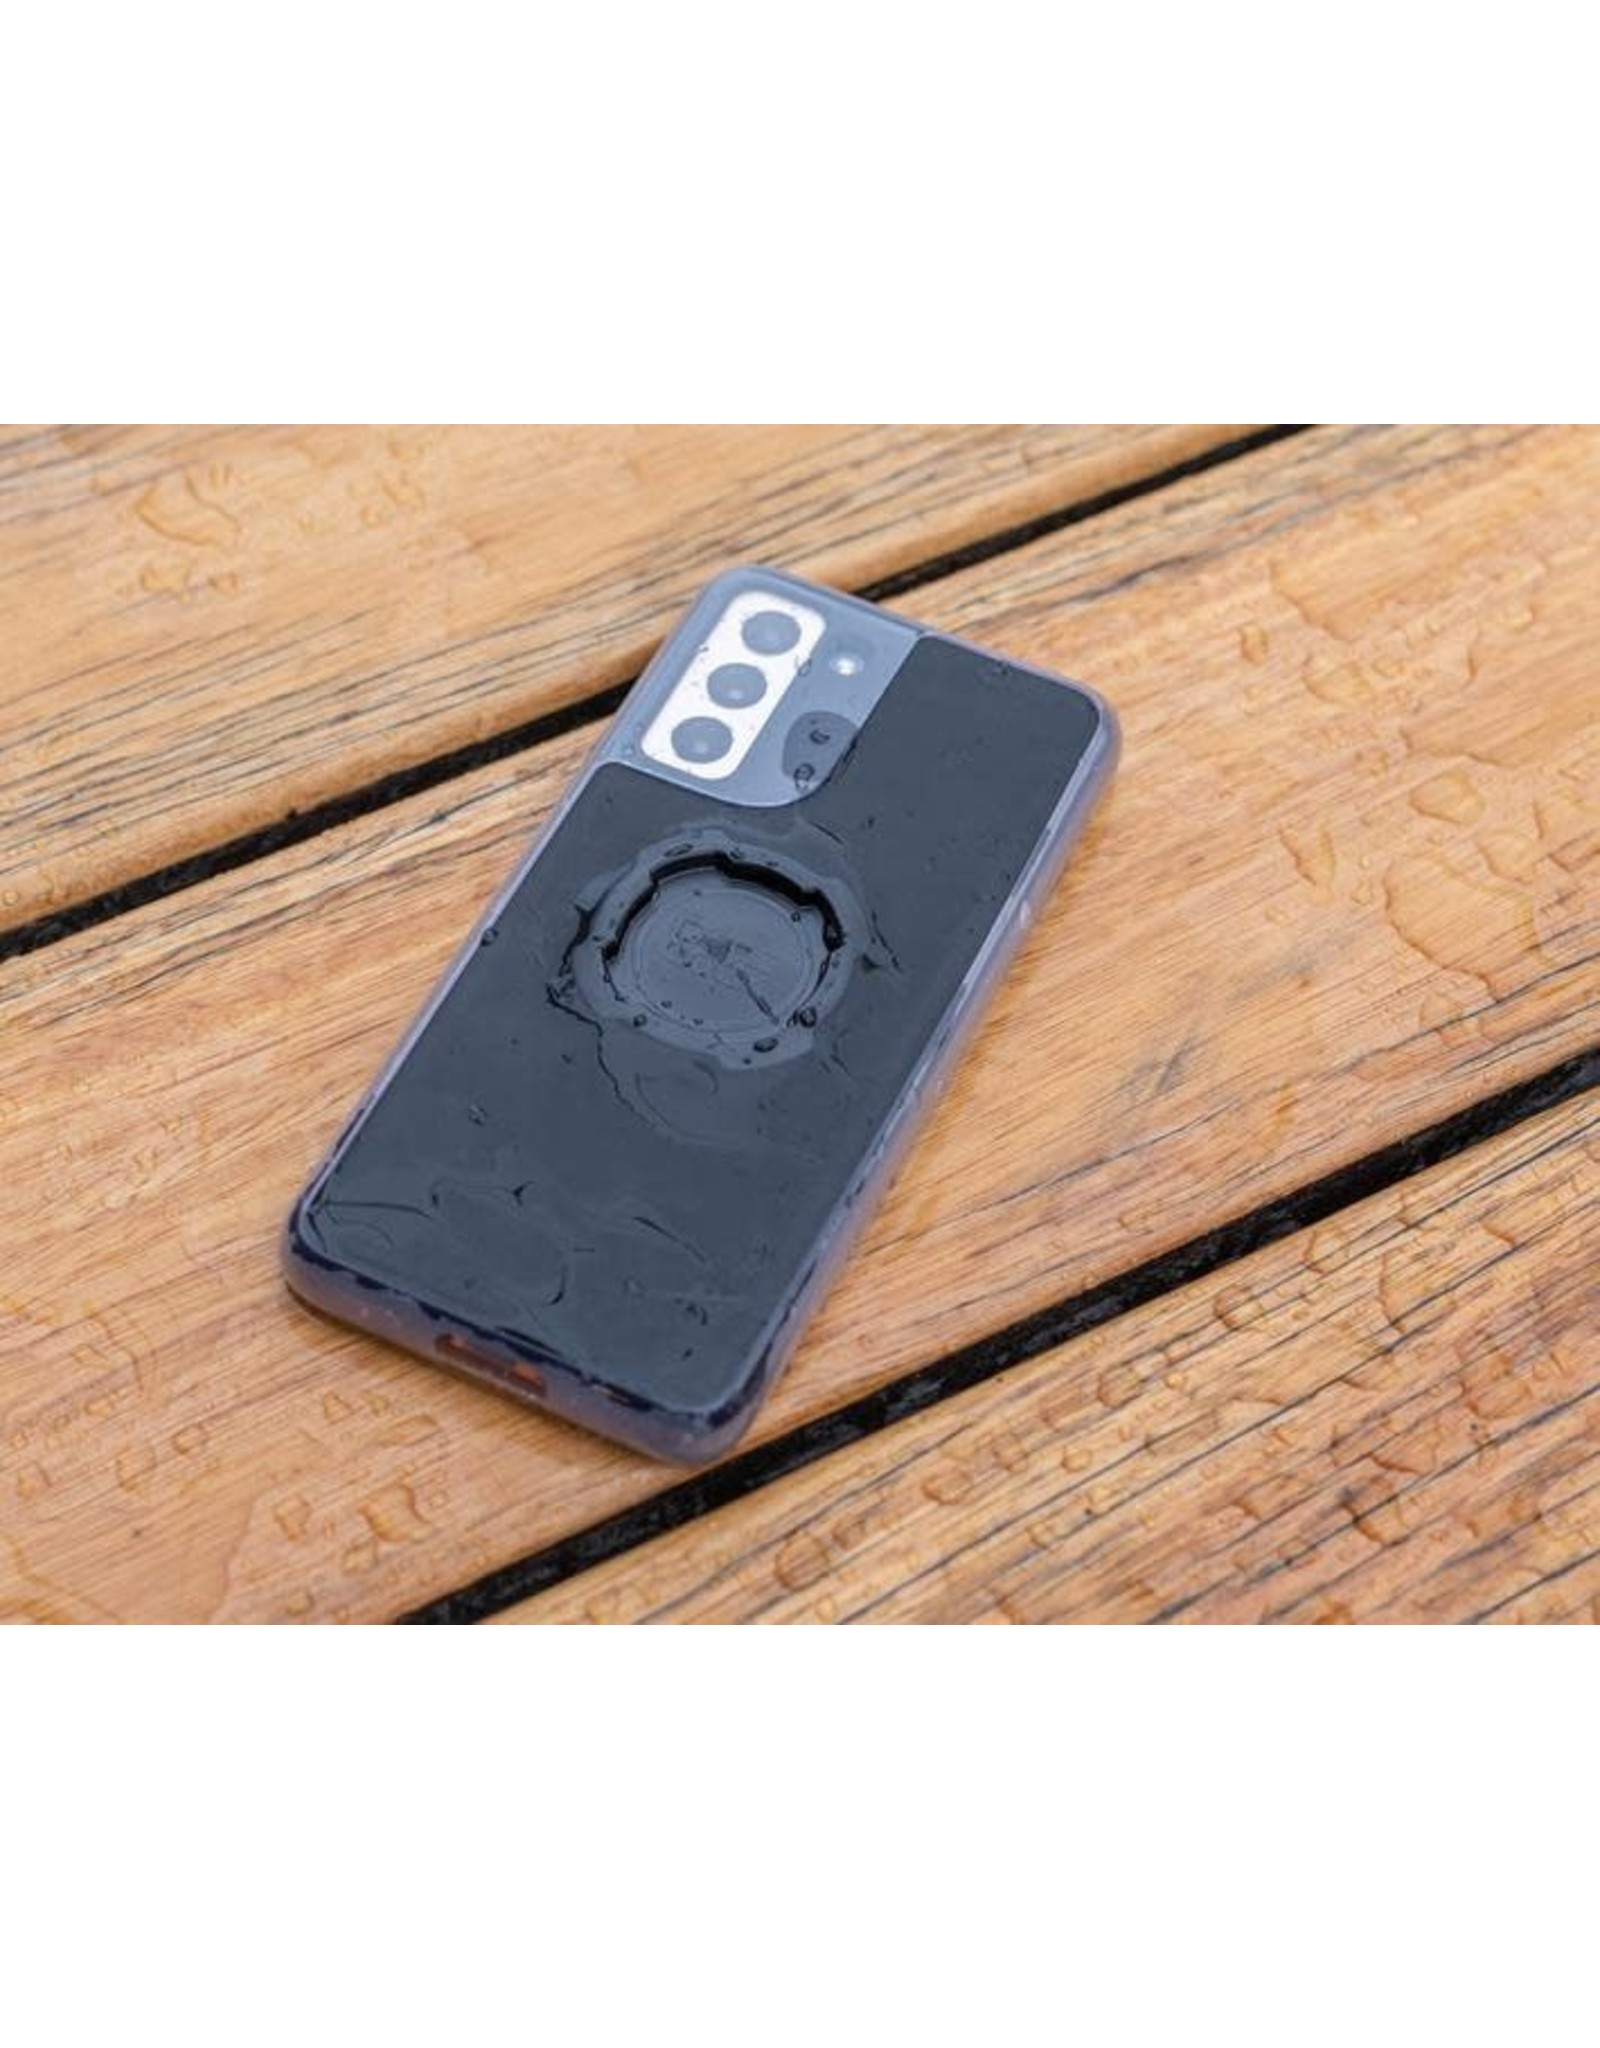 Quad Lock Galaxy S21+ Phone Mount Case